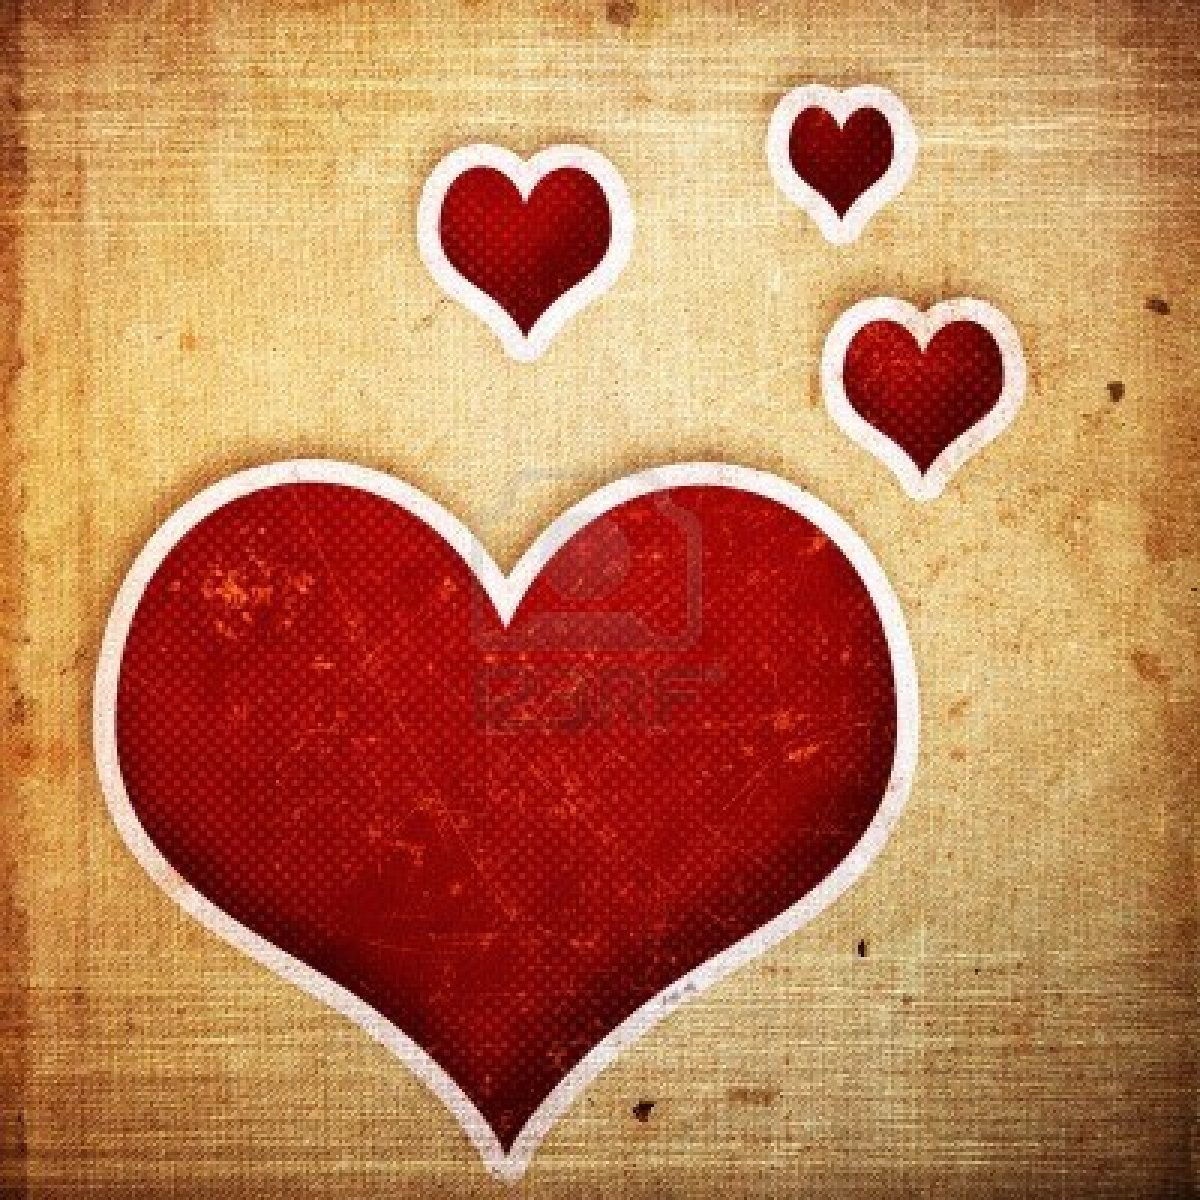 Kata Kata Mutiara Cinta untuk Kakak Senior